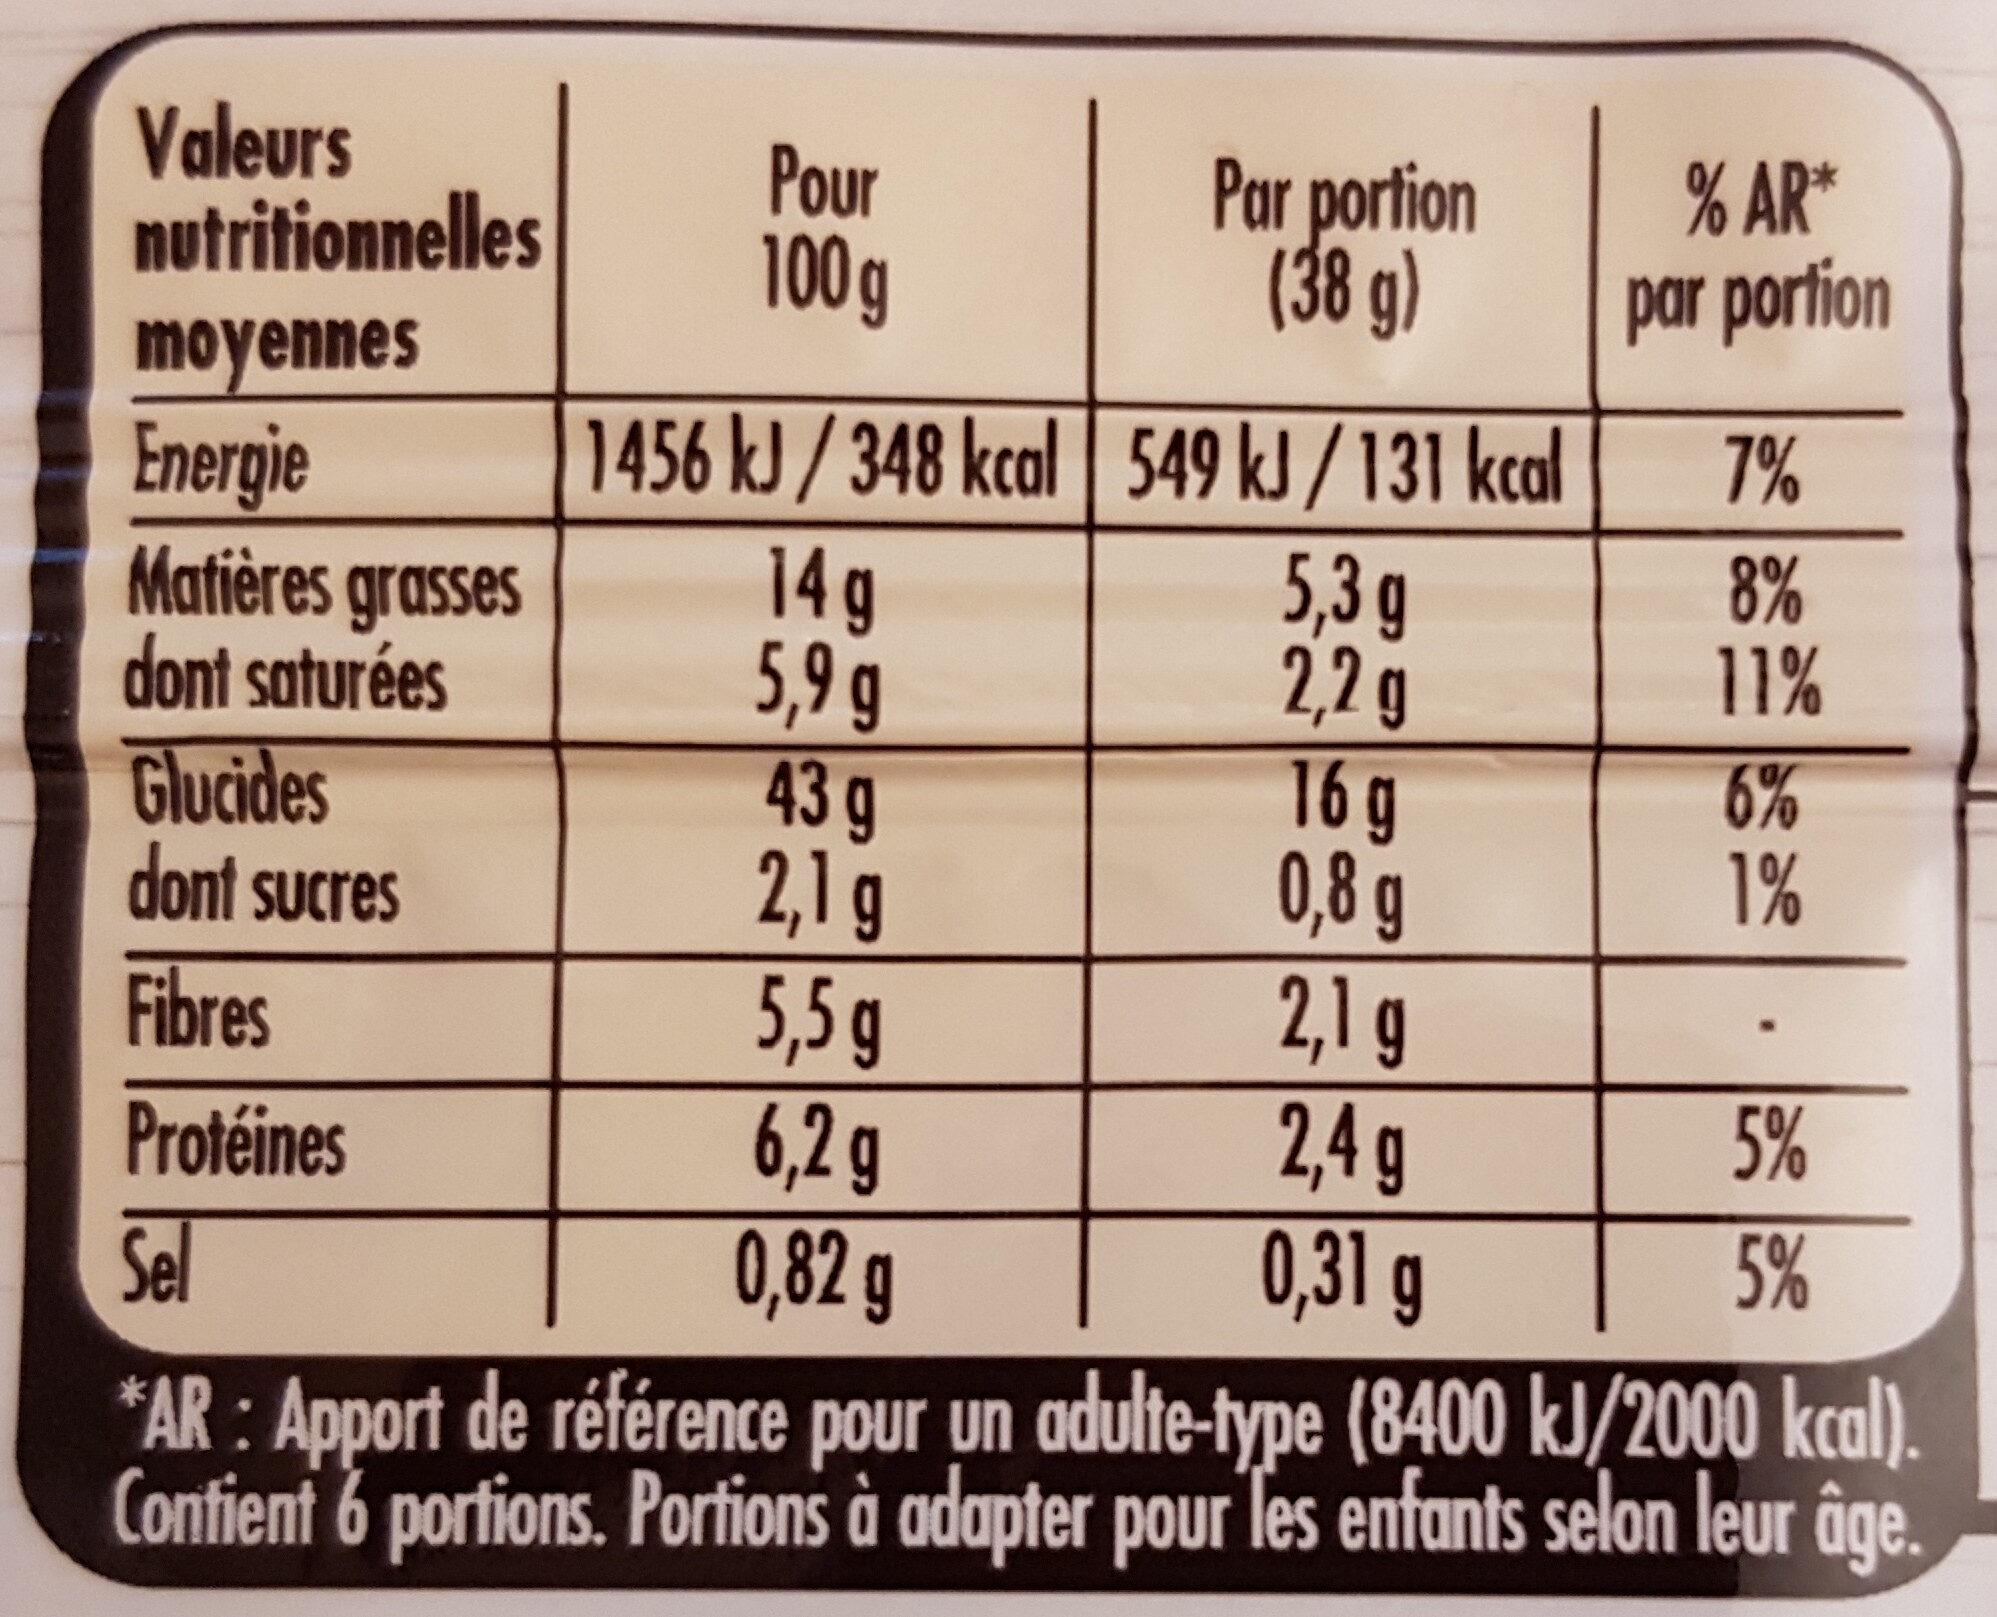 Pate Brisée sans additif - Voedingswaarden - fr